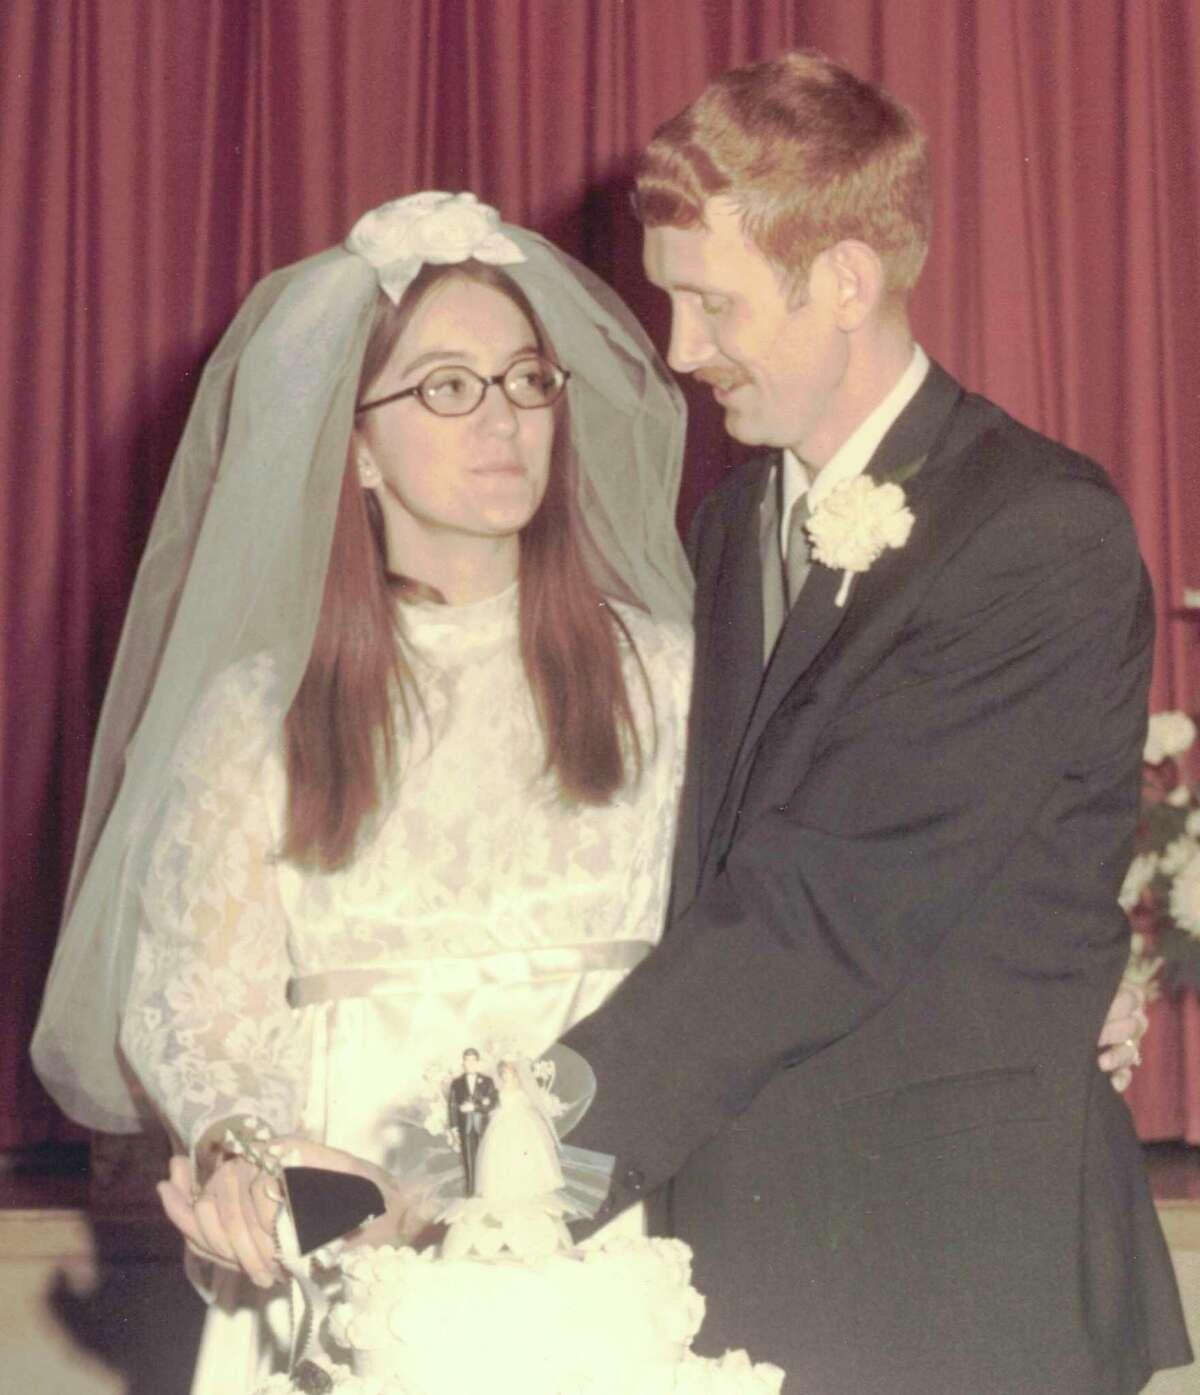 Helen Jane Wolfe and Roger Scott Dewey were married on Dec.27, 1970, at First Presbyterian Church in Harrisburg, Pennsylvania. (Courtesy photo)